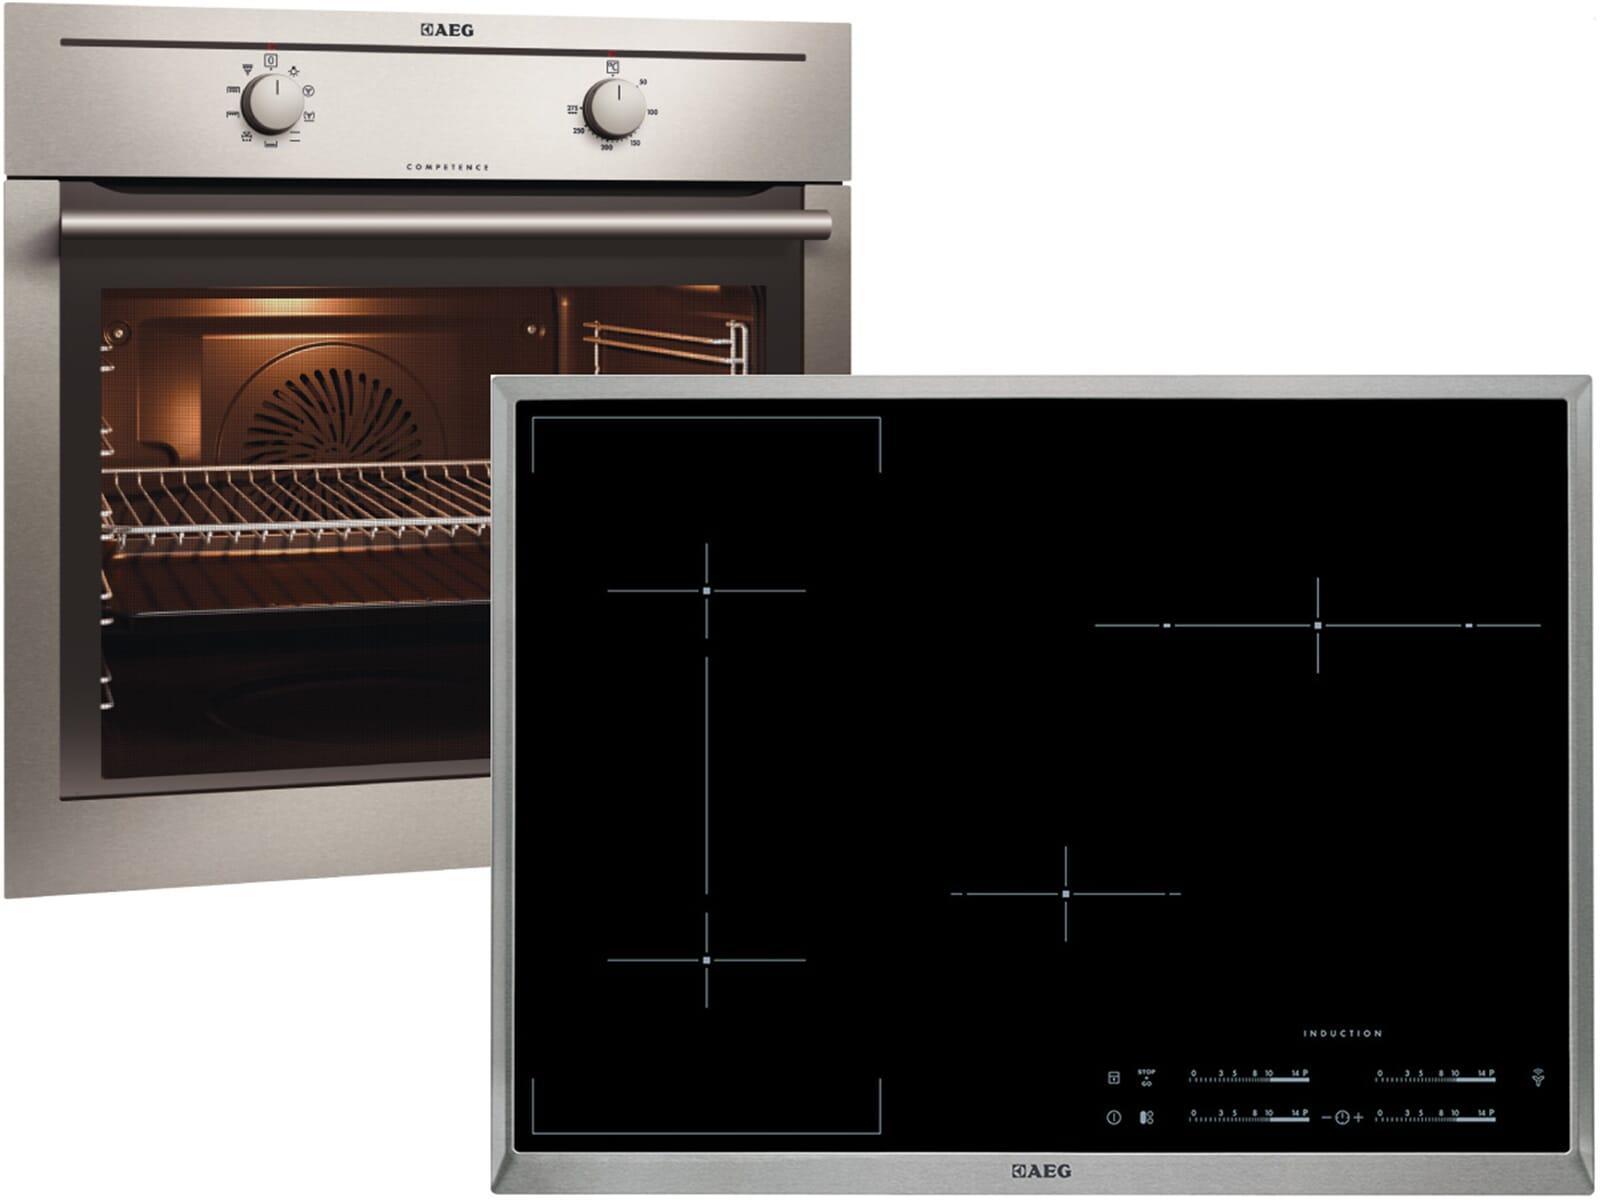 aeg backofenset be2000201m induktionskochfeld hk854420x. Black Bedroom Furniture Sets. Home Design Ideas